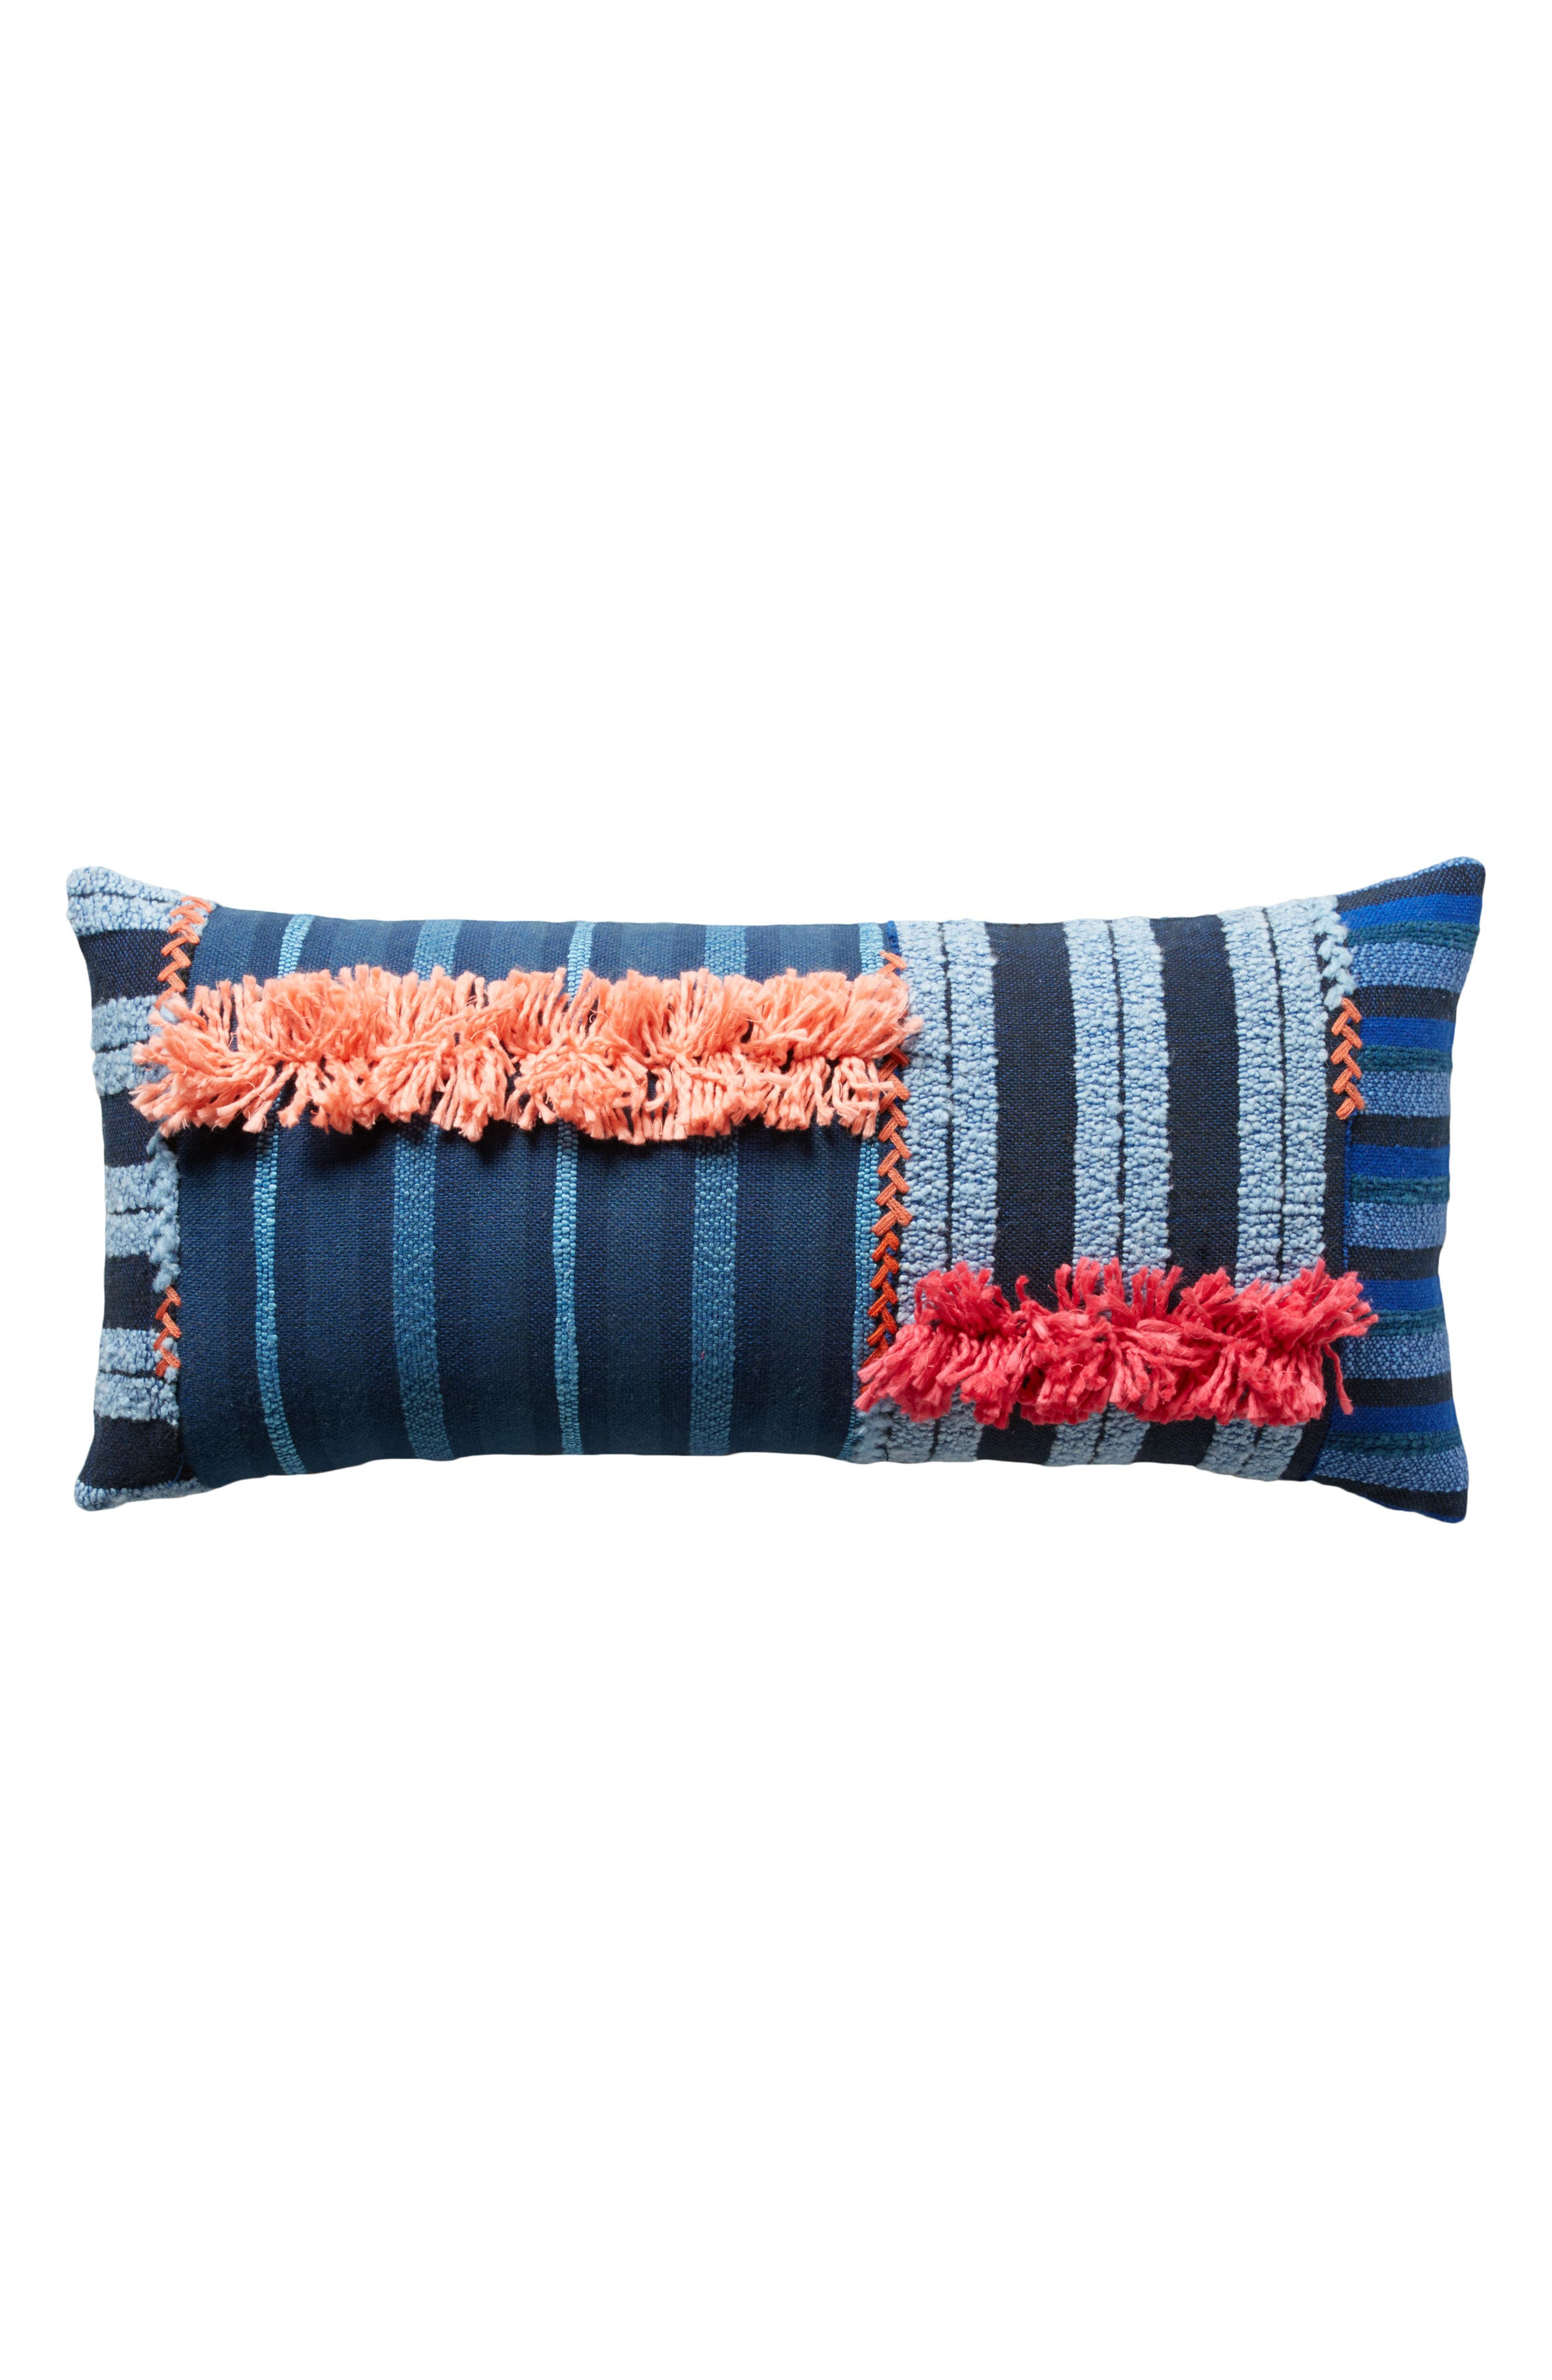 Yoursa Accent Pillow,                             Main thumbnail 1, color,                             400